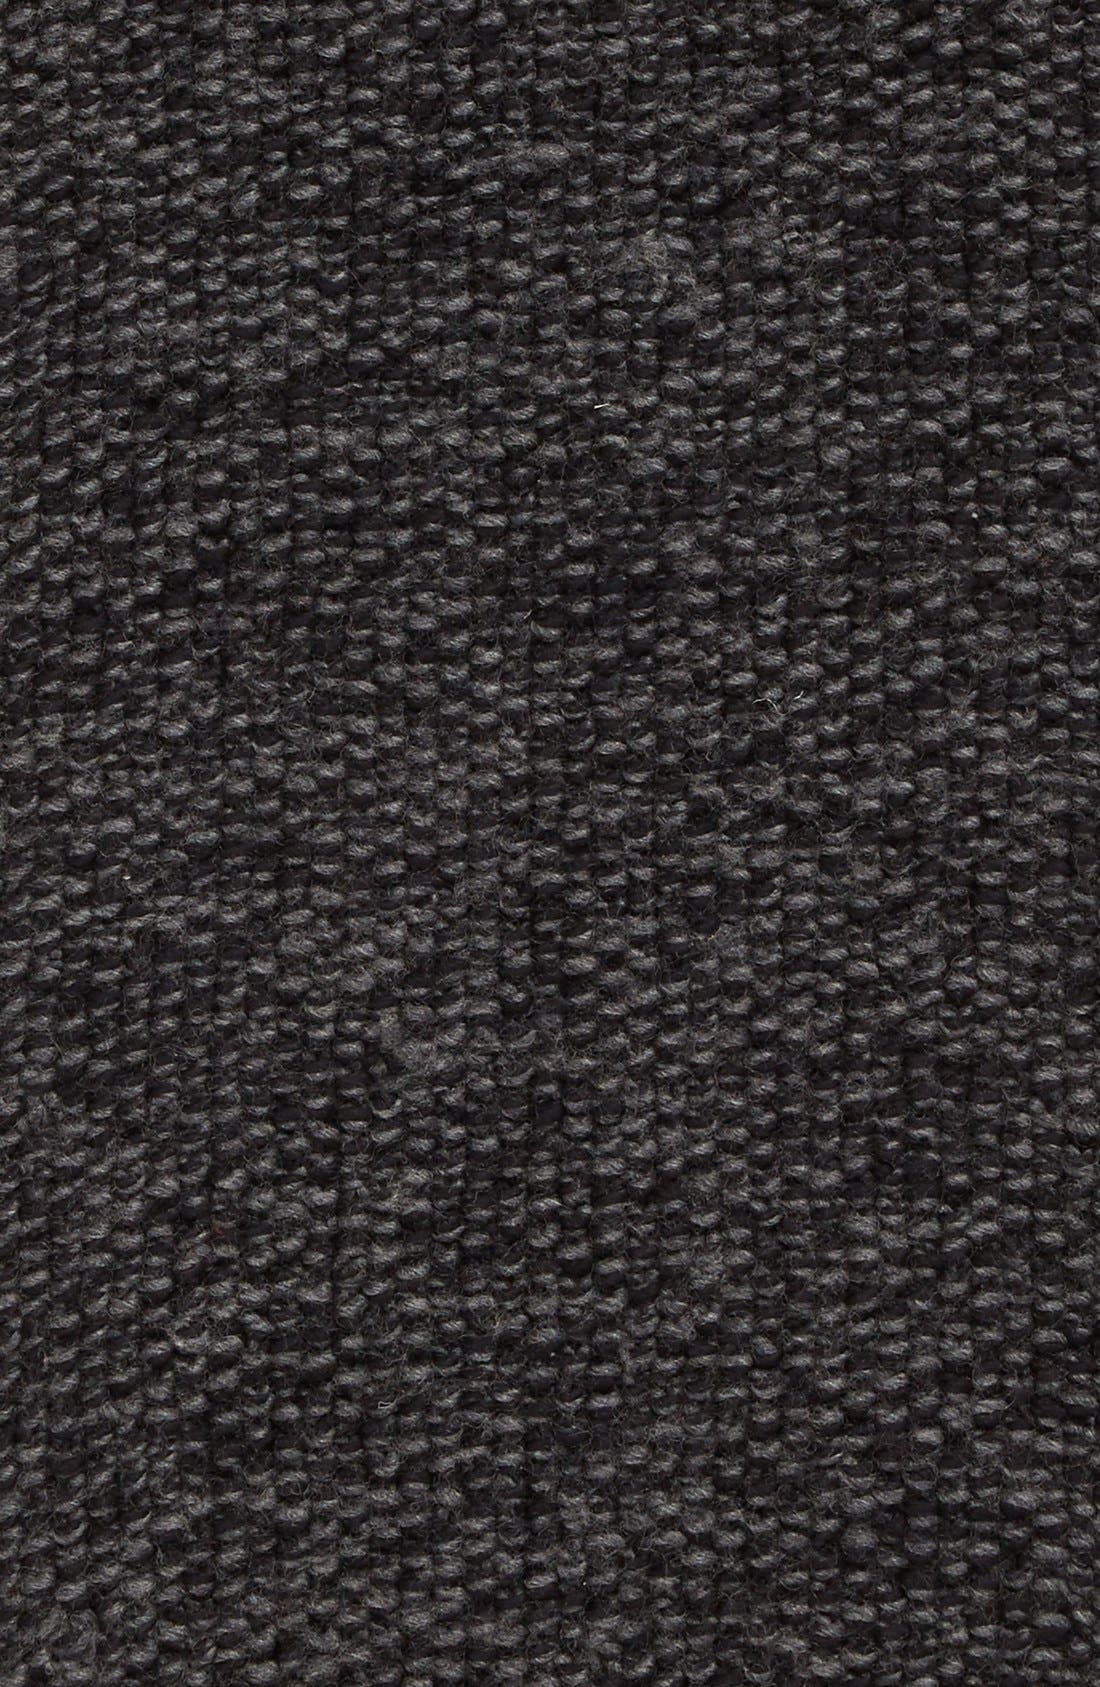 Alternate Image 3  - Nirvanna Designs Knit Wool Infinity Scarf